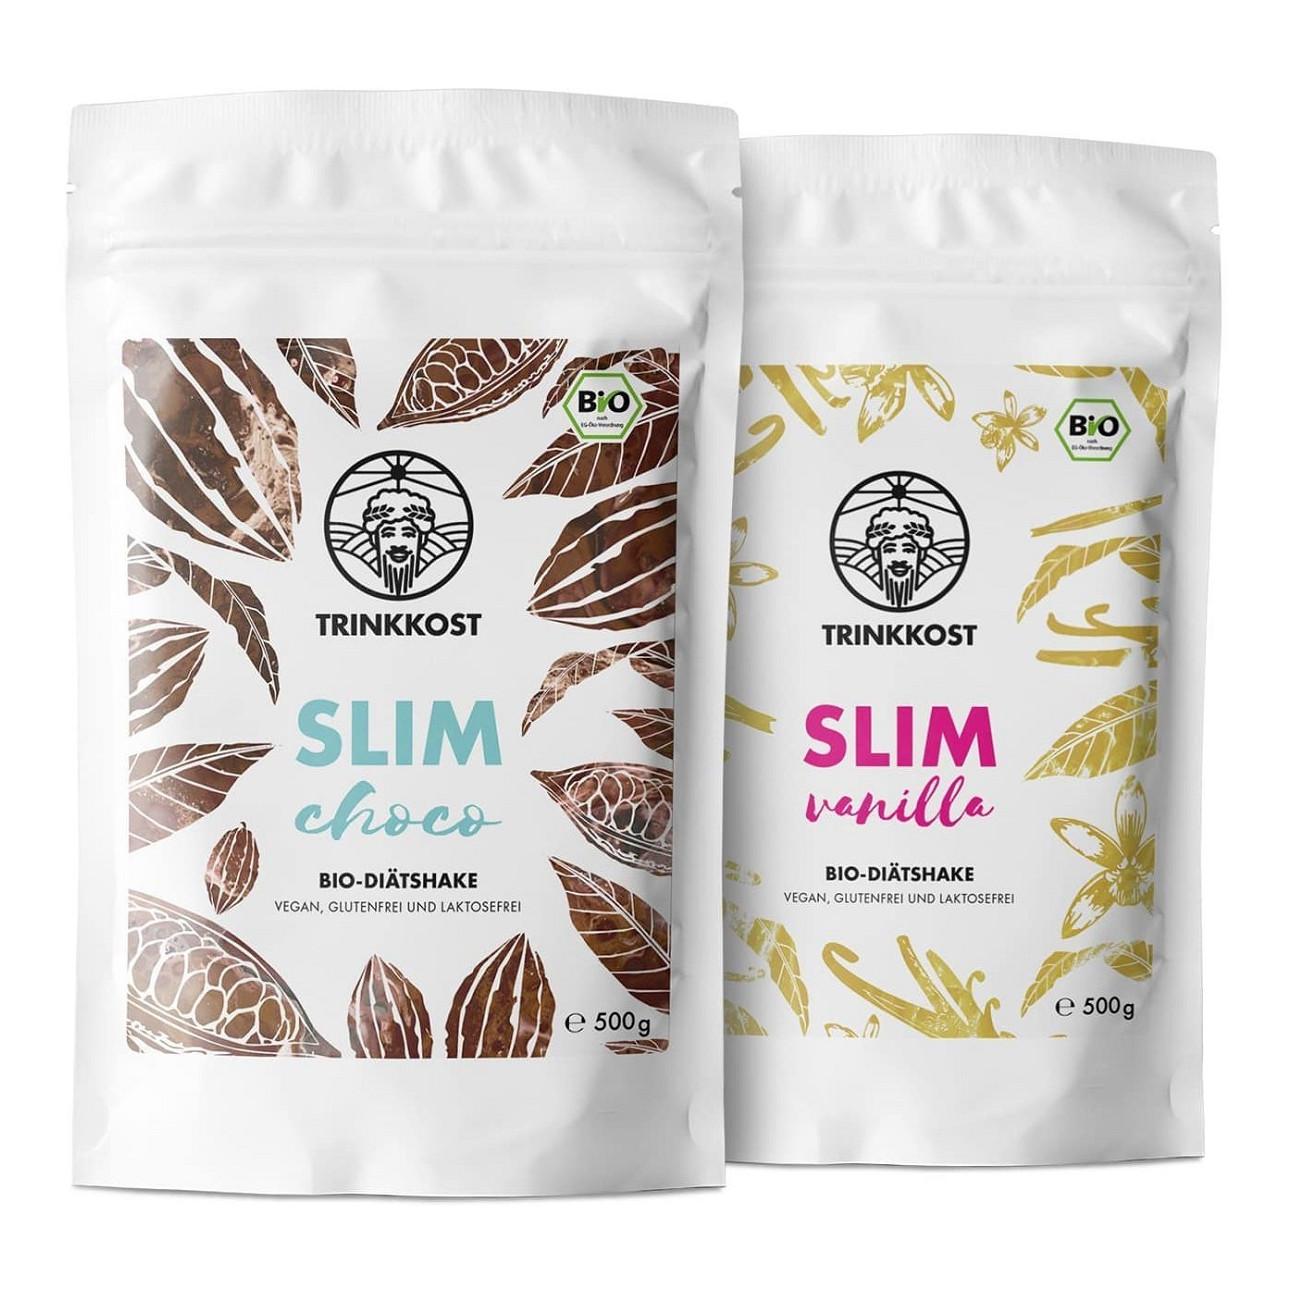 Trinkkost Slim Vegan product image